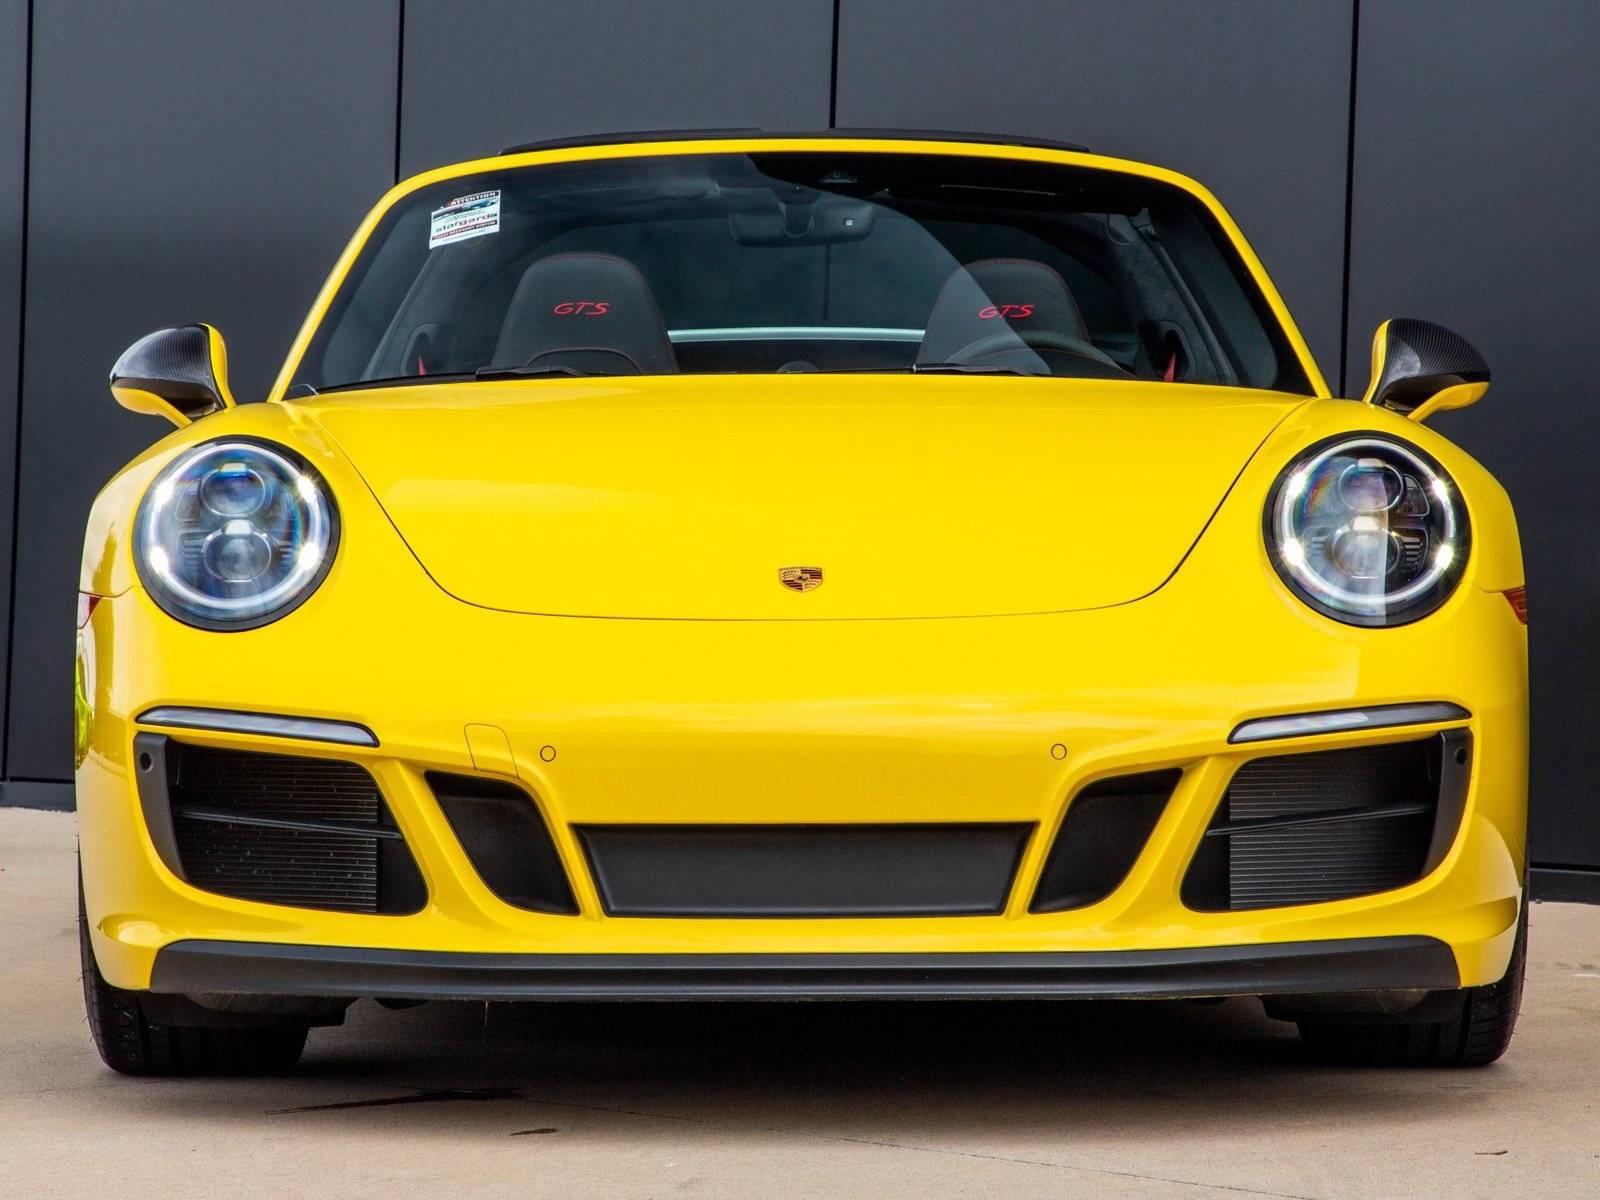 2019 Porsche 911 Targa 4 GTS – 5